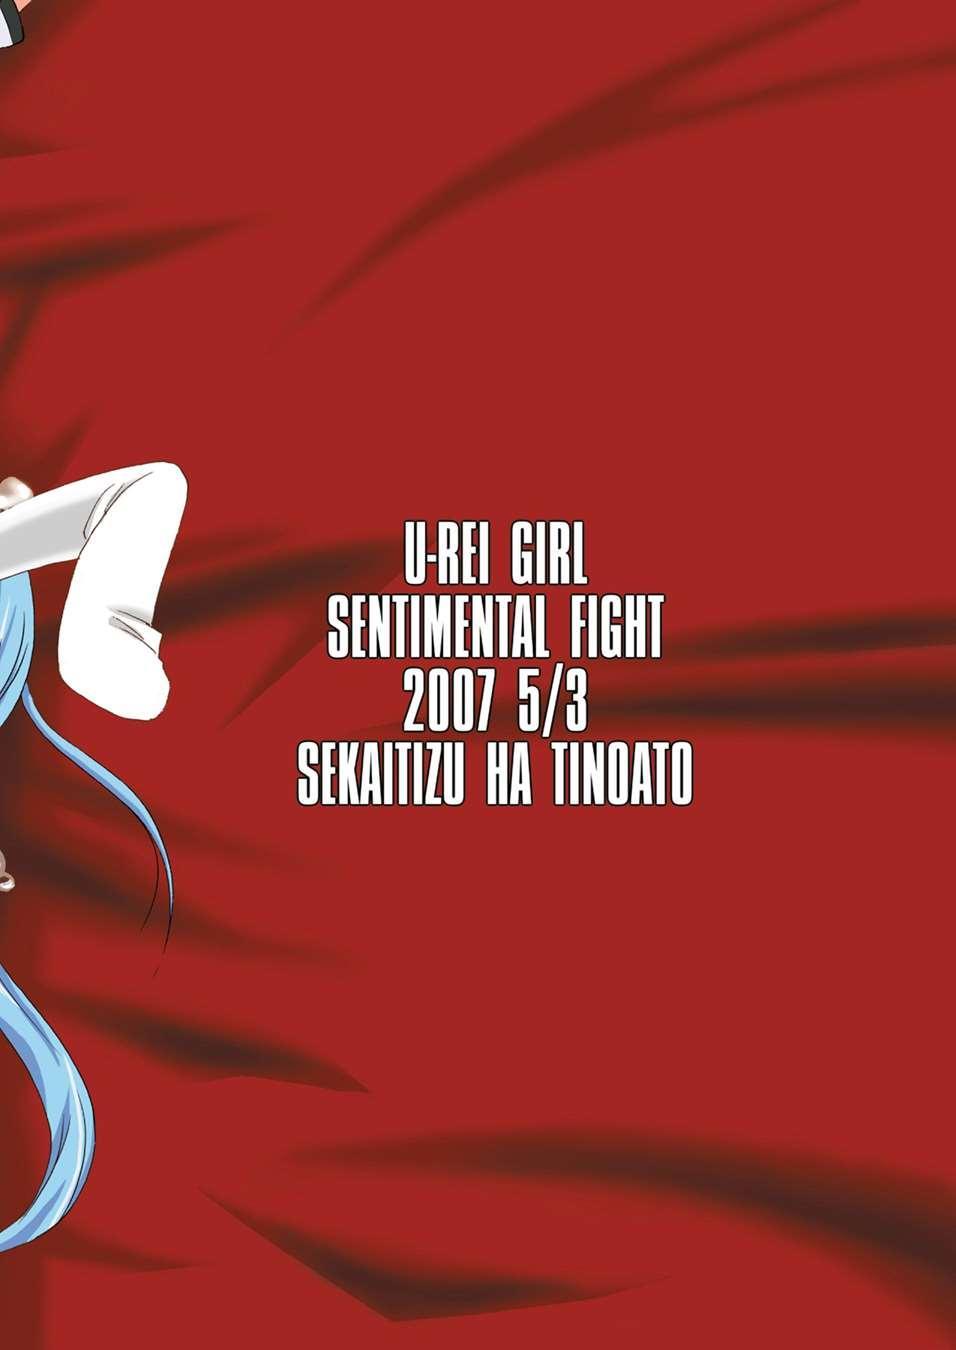 U-REI GIRL SENTIMENTAL FIGHT 26